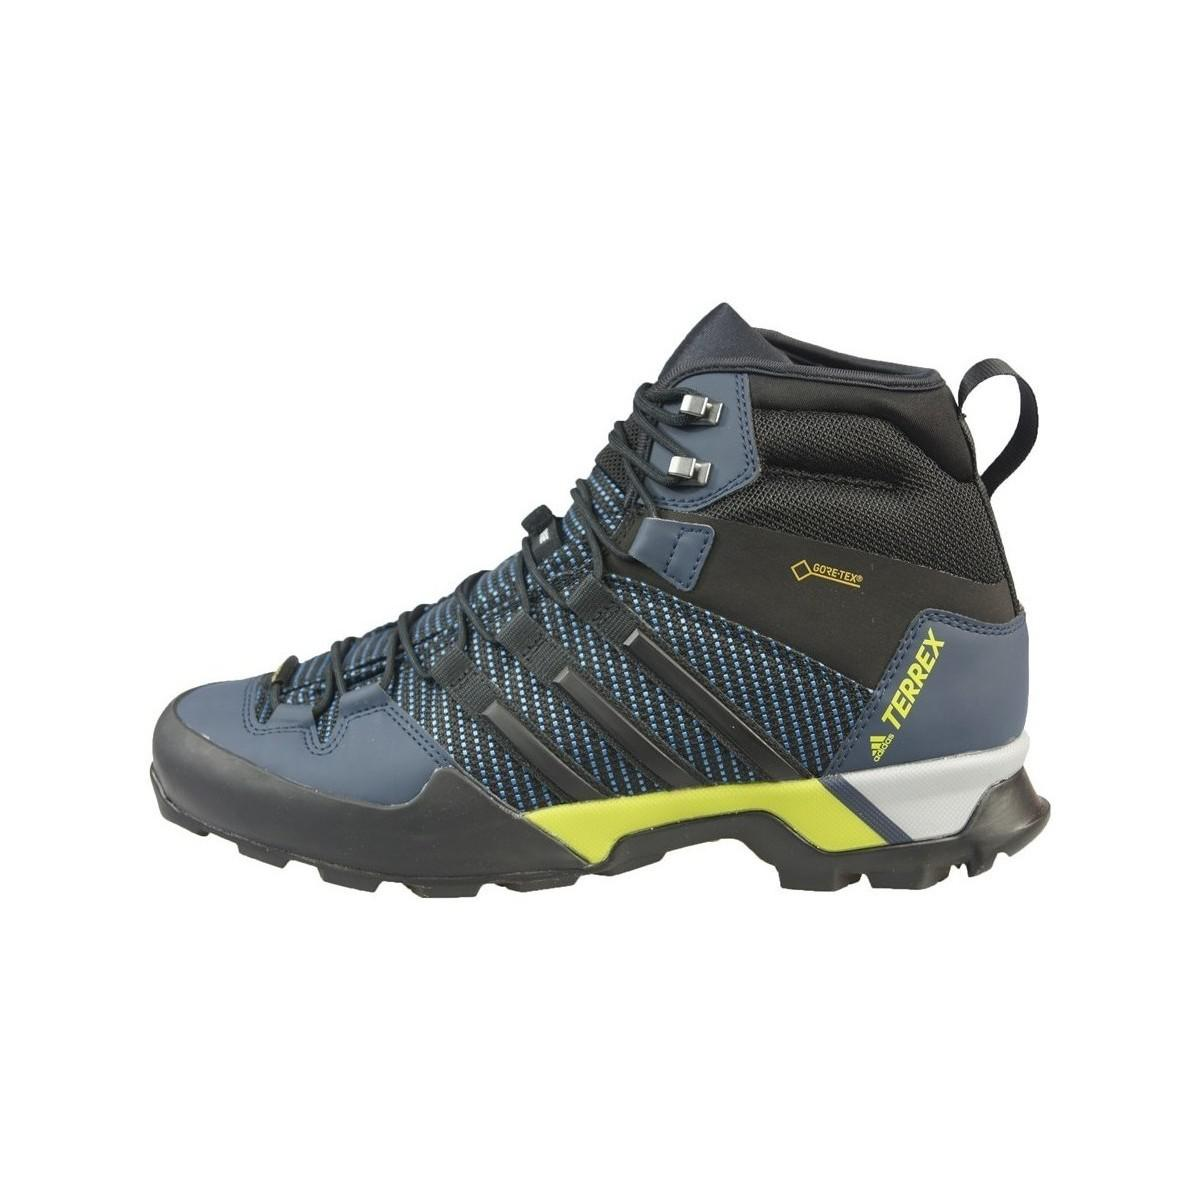 181c15a500b adidas Terrex Scope High Gtx Men s Walking Boots In Blue in Blue for ...